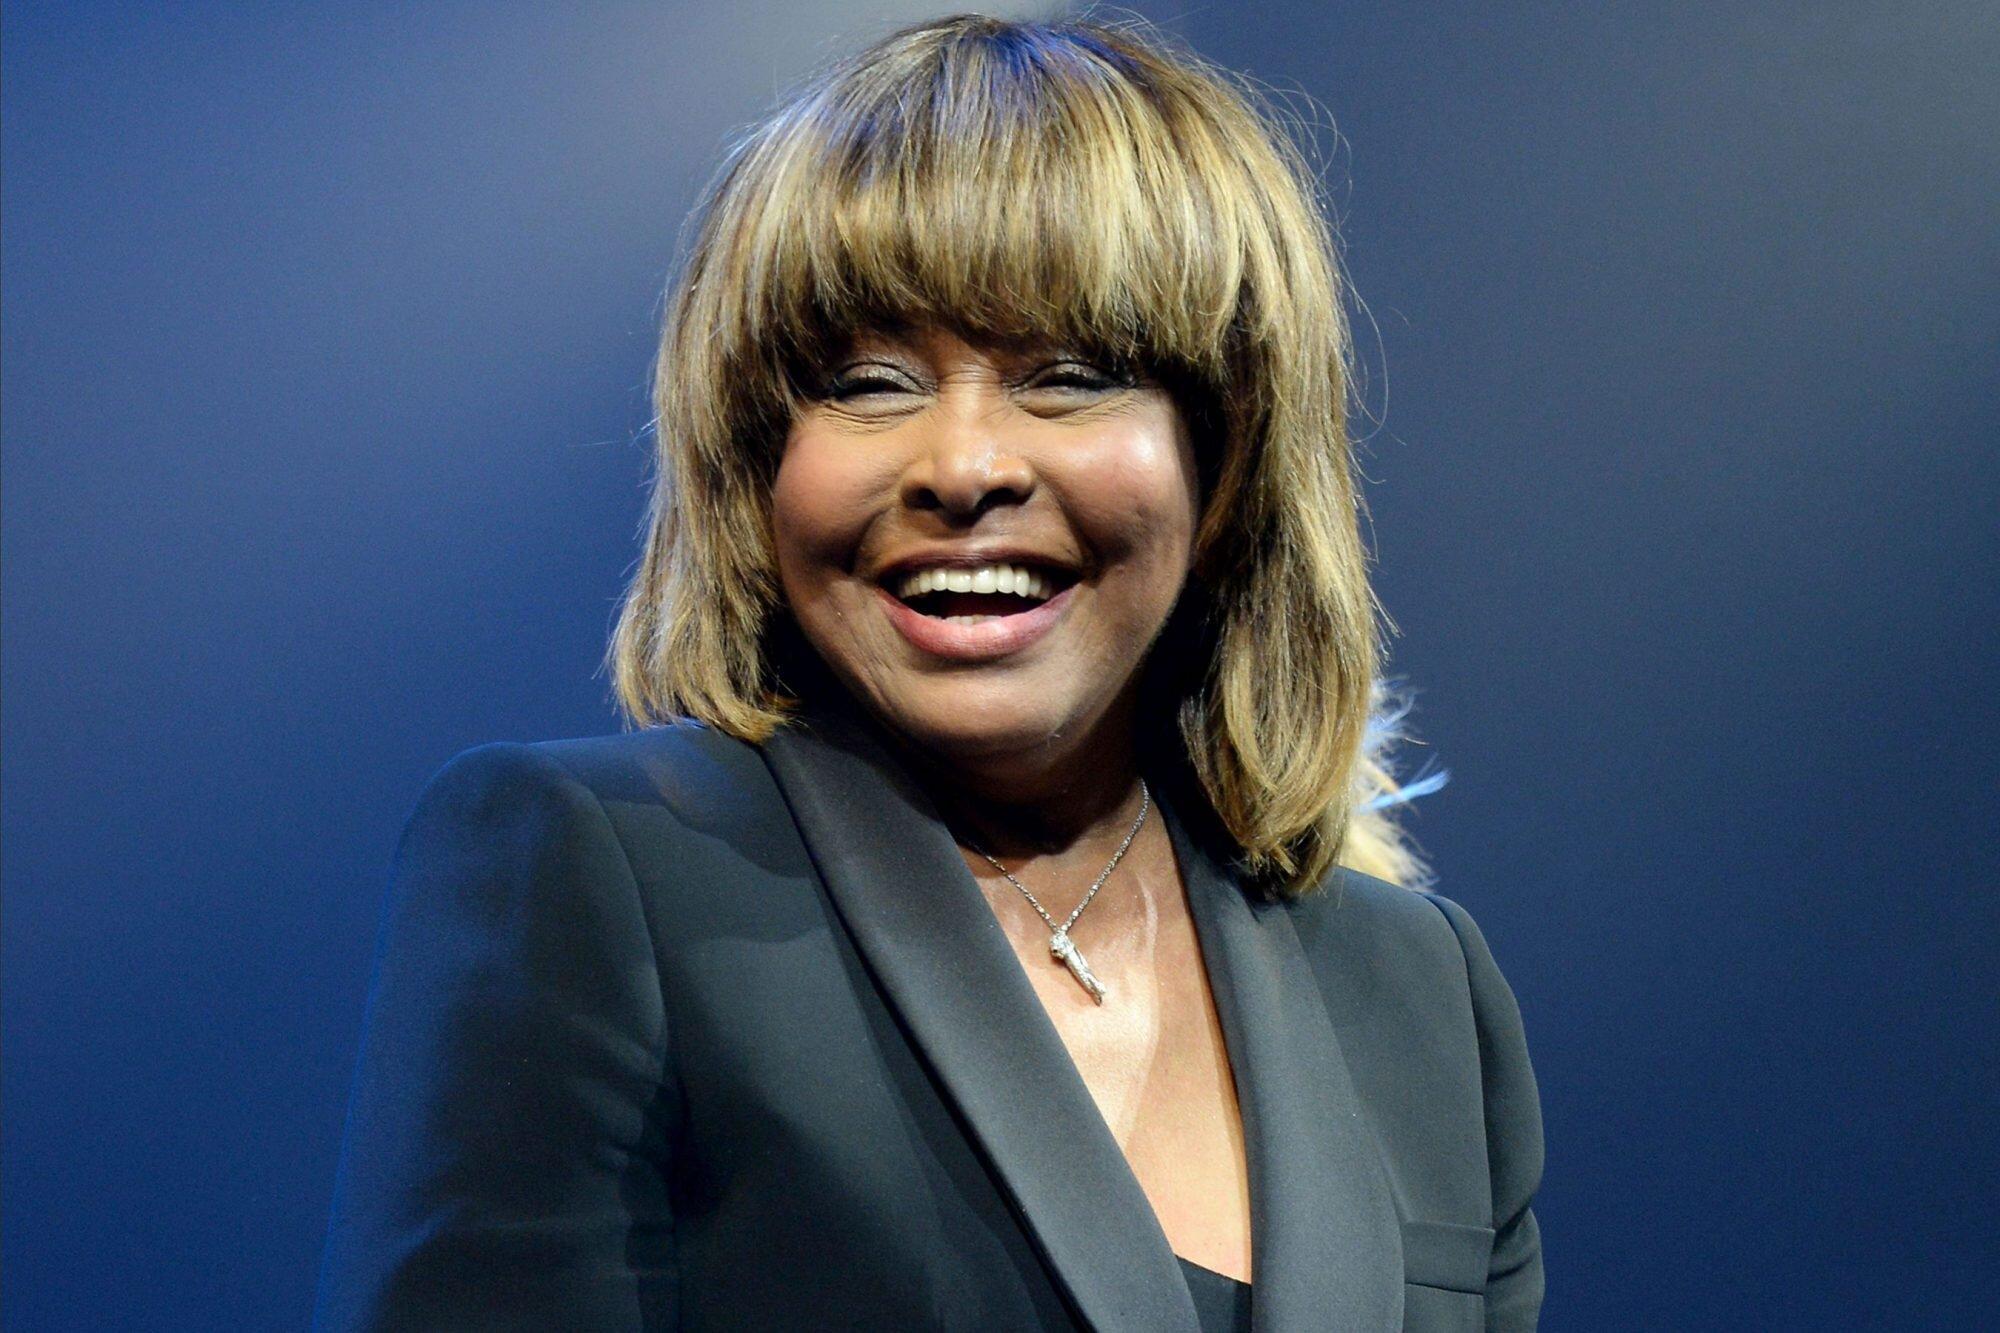 2018 tina turner age Tina Turner's